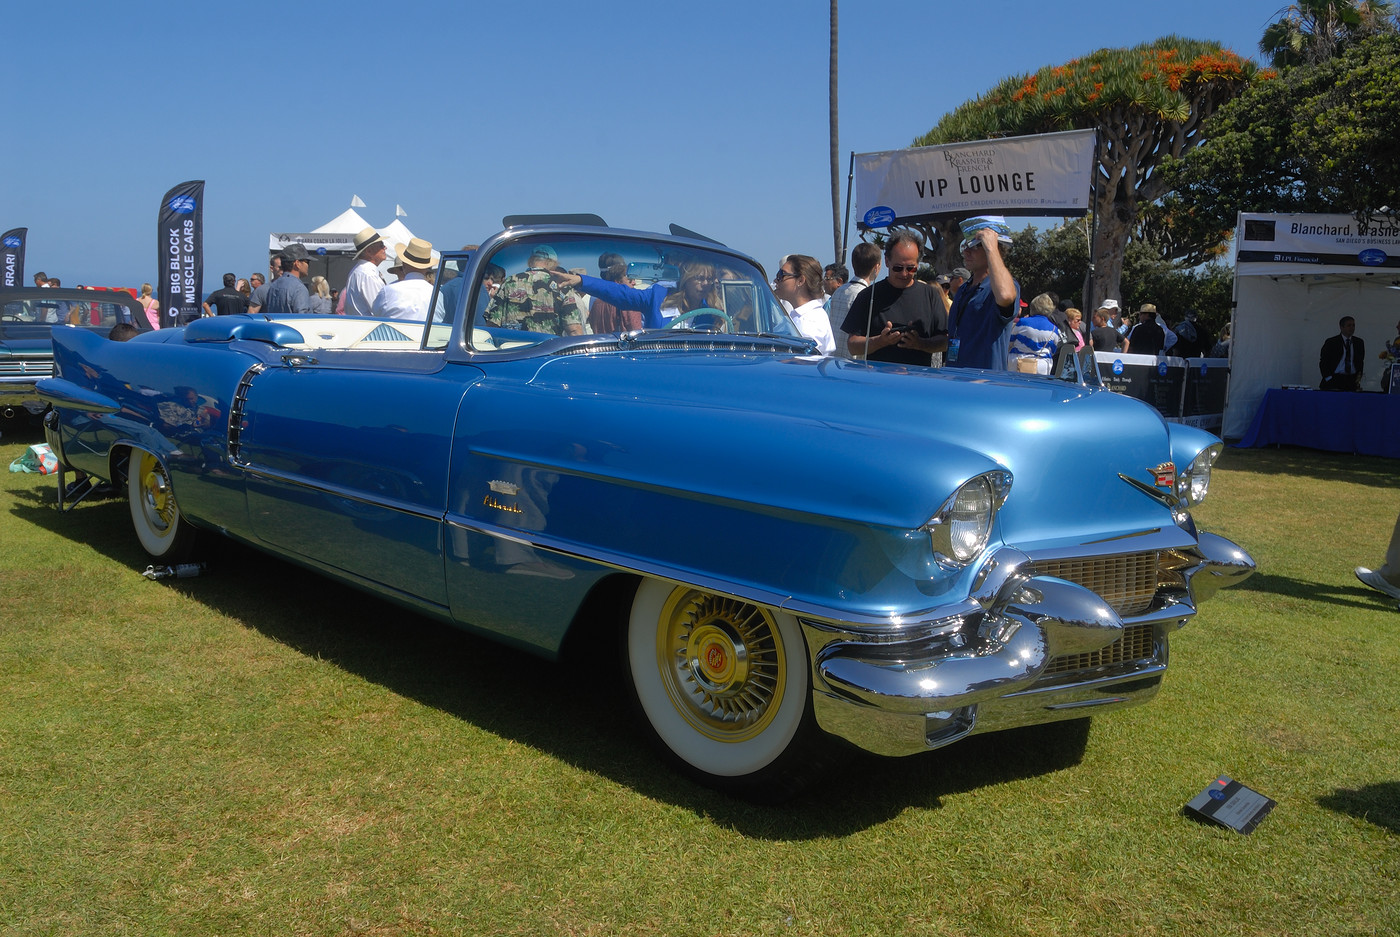 1956 Cadillac Eldorado convertible owned by John Ellison, Jr, of The Calumet Collection DSC 3755 - Copy